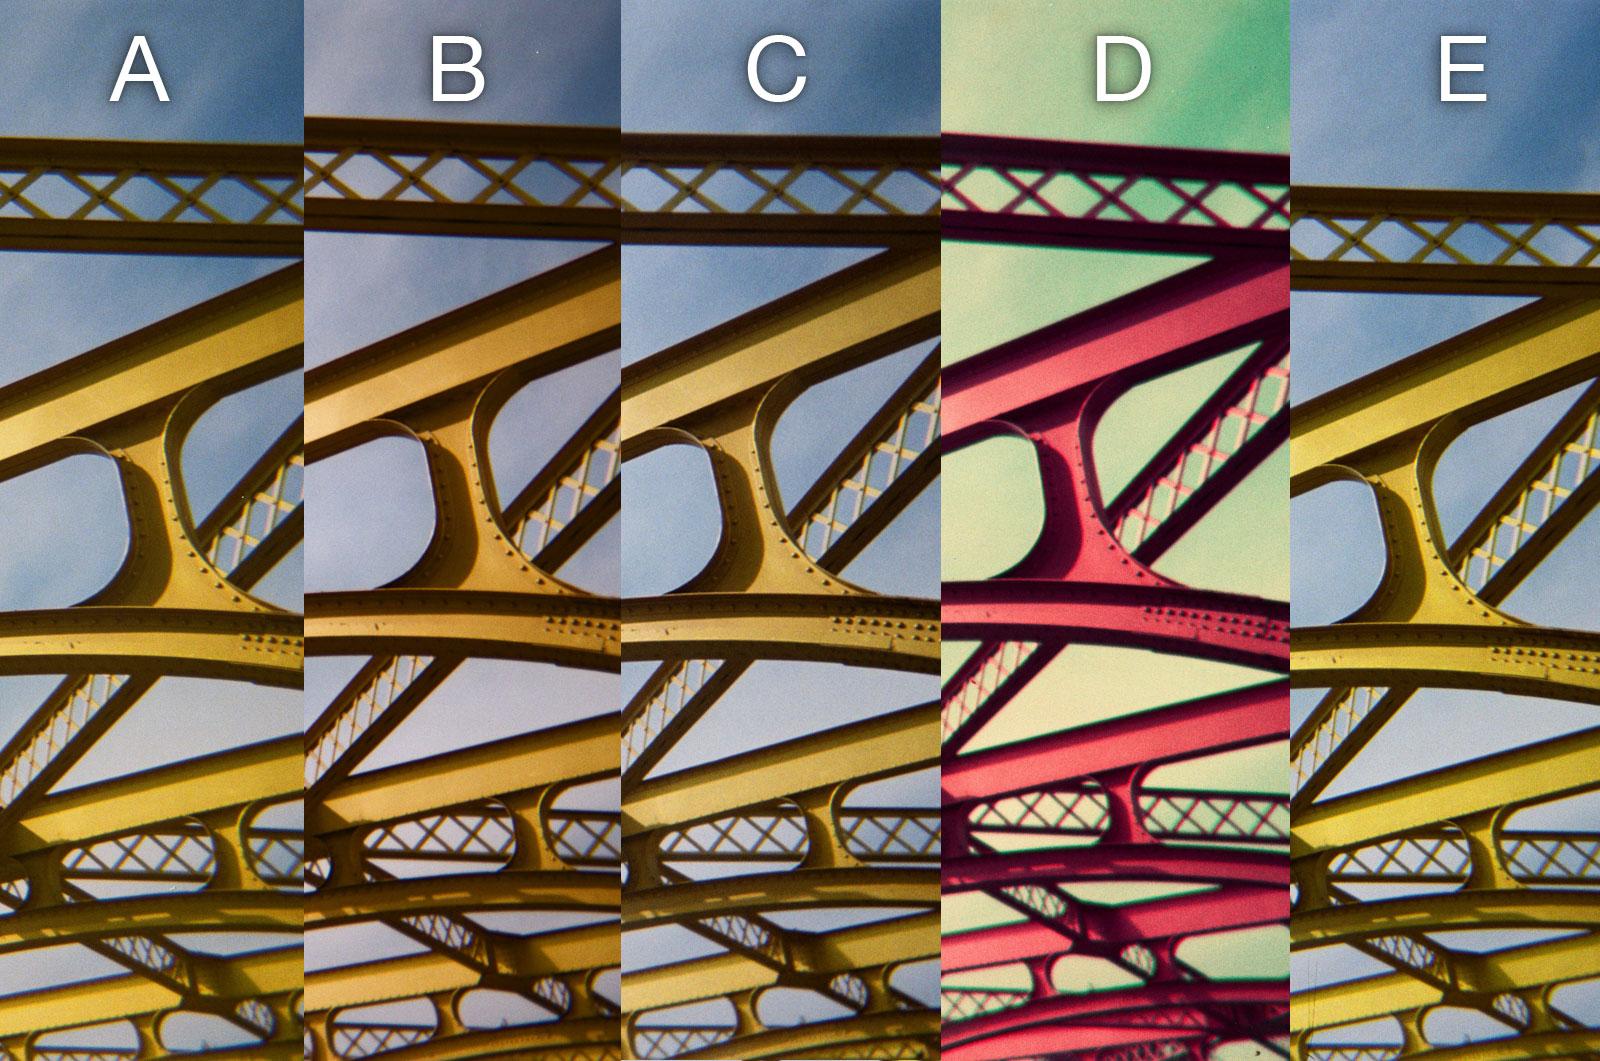 Disposable Cameras Comparison - Bridge